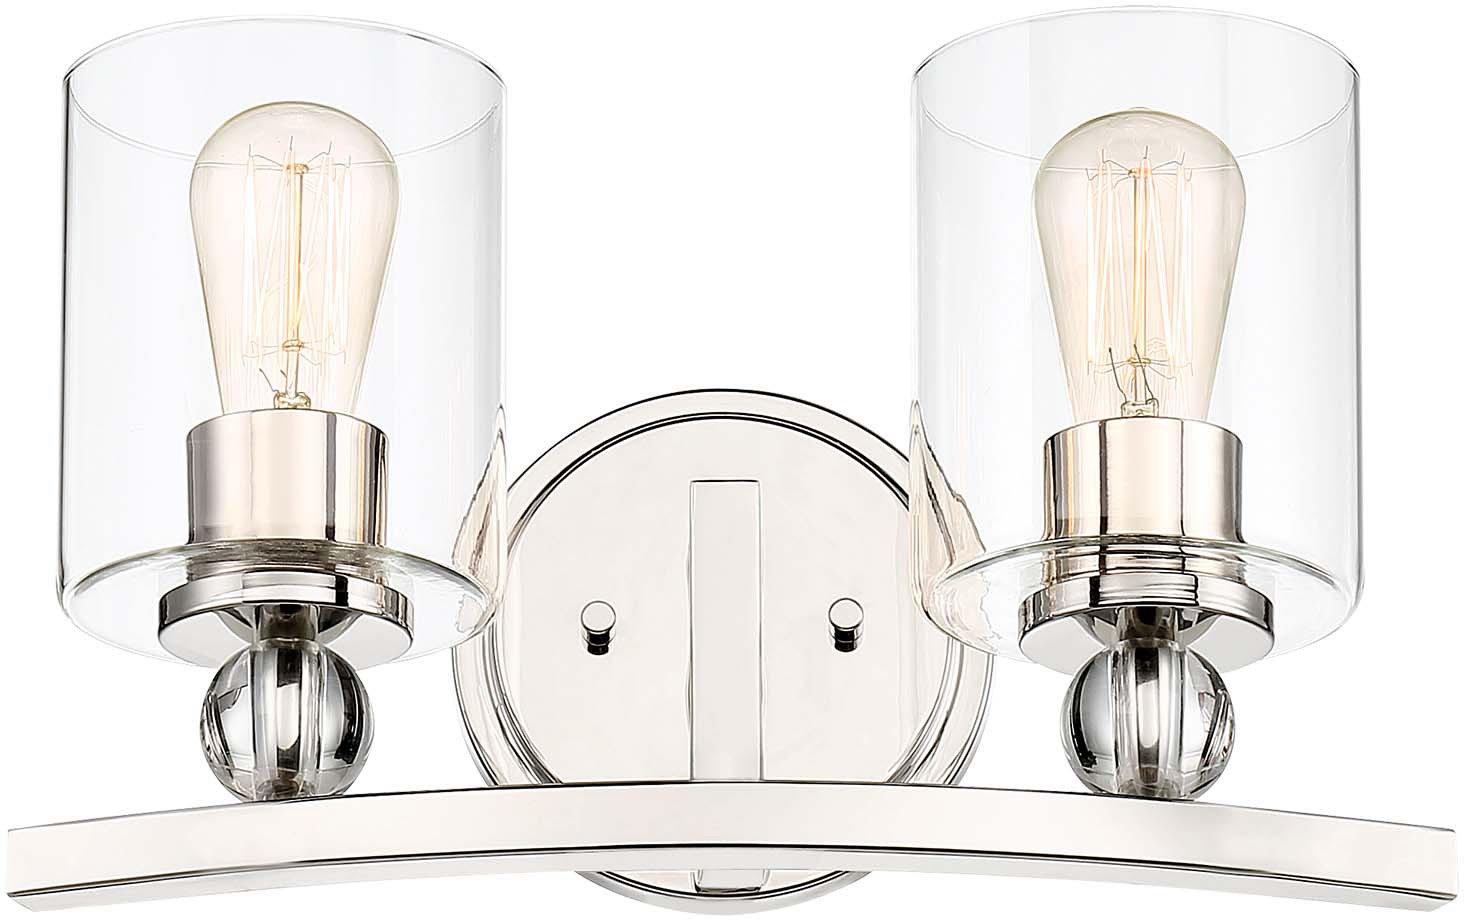 minka-lavery 3072 – 613 Studio 5 LED 16インチポリッシュニッケルbath-bar Lite壁ライト   B076DL8QZS